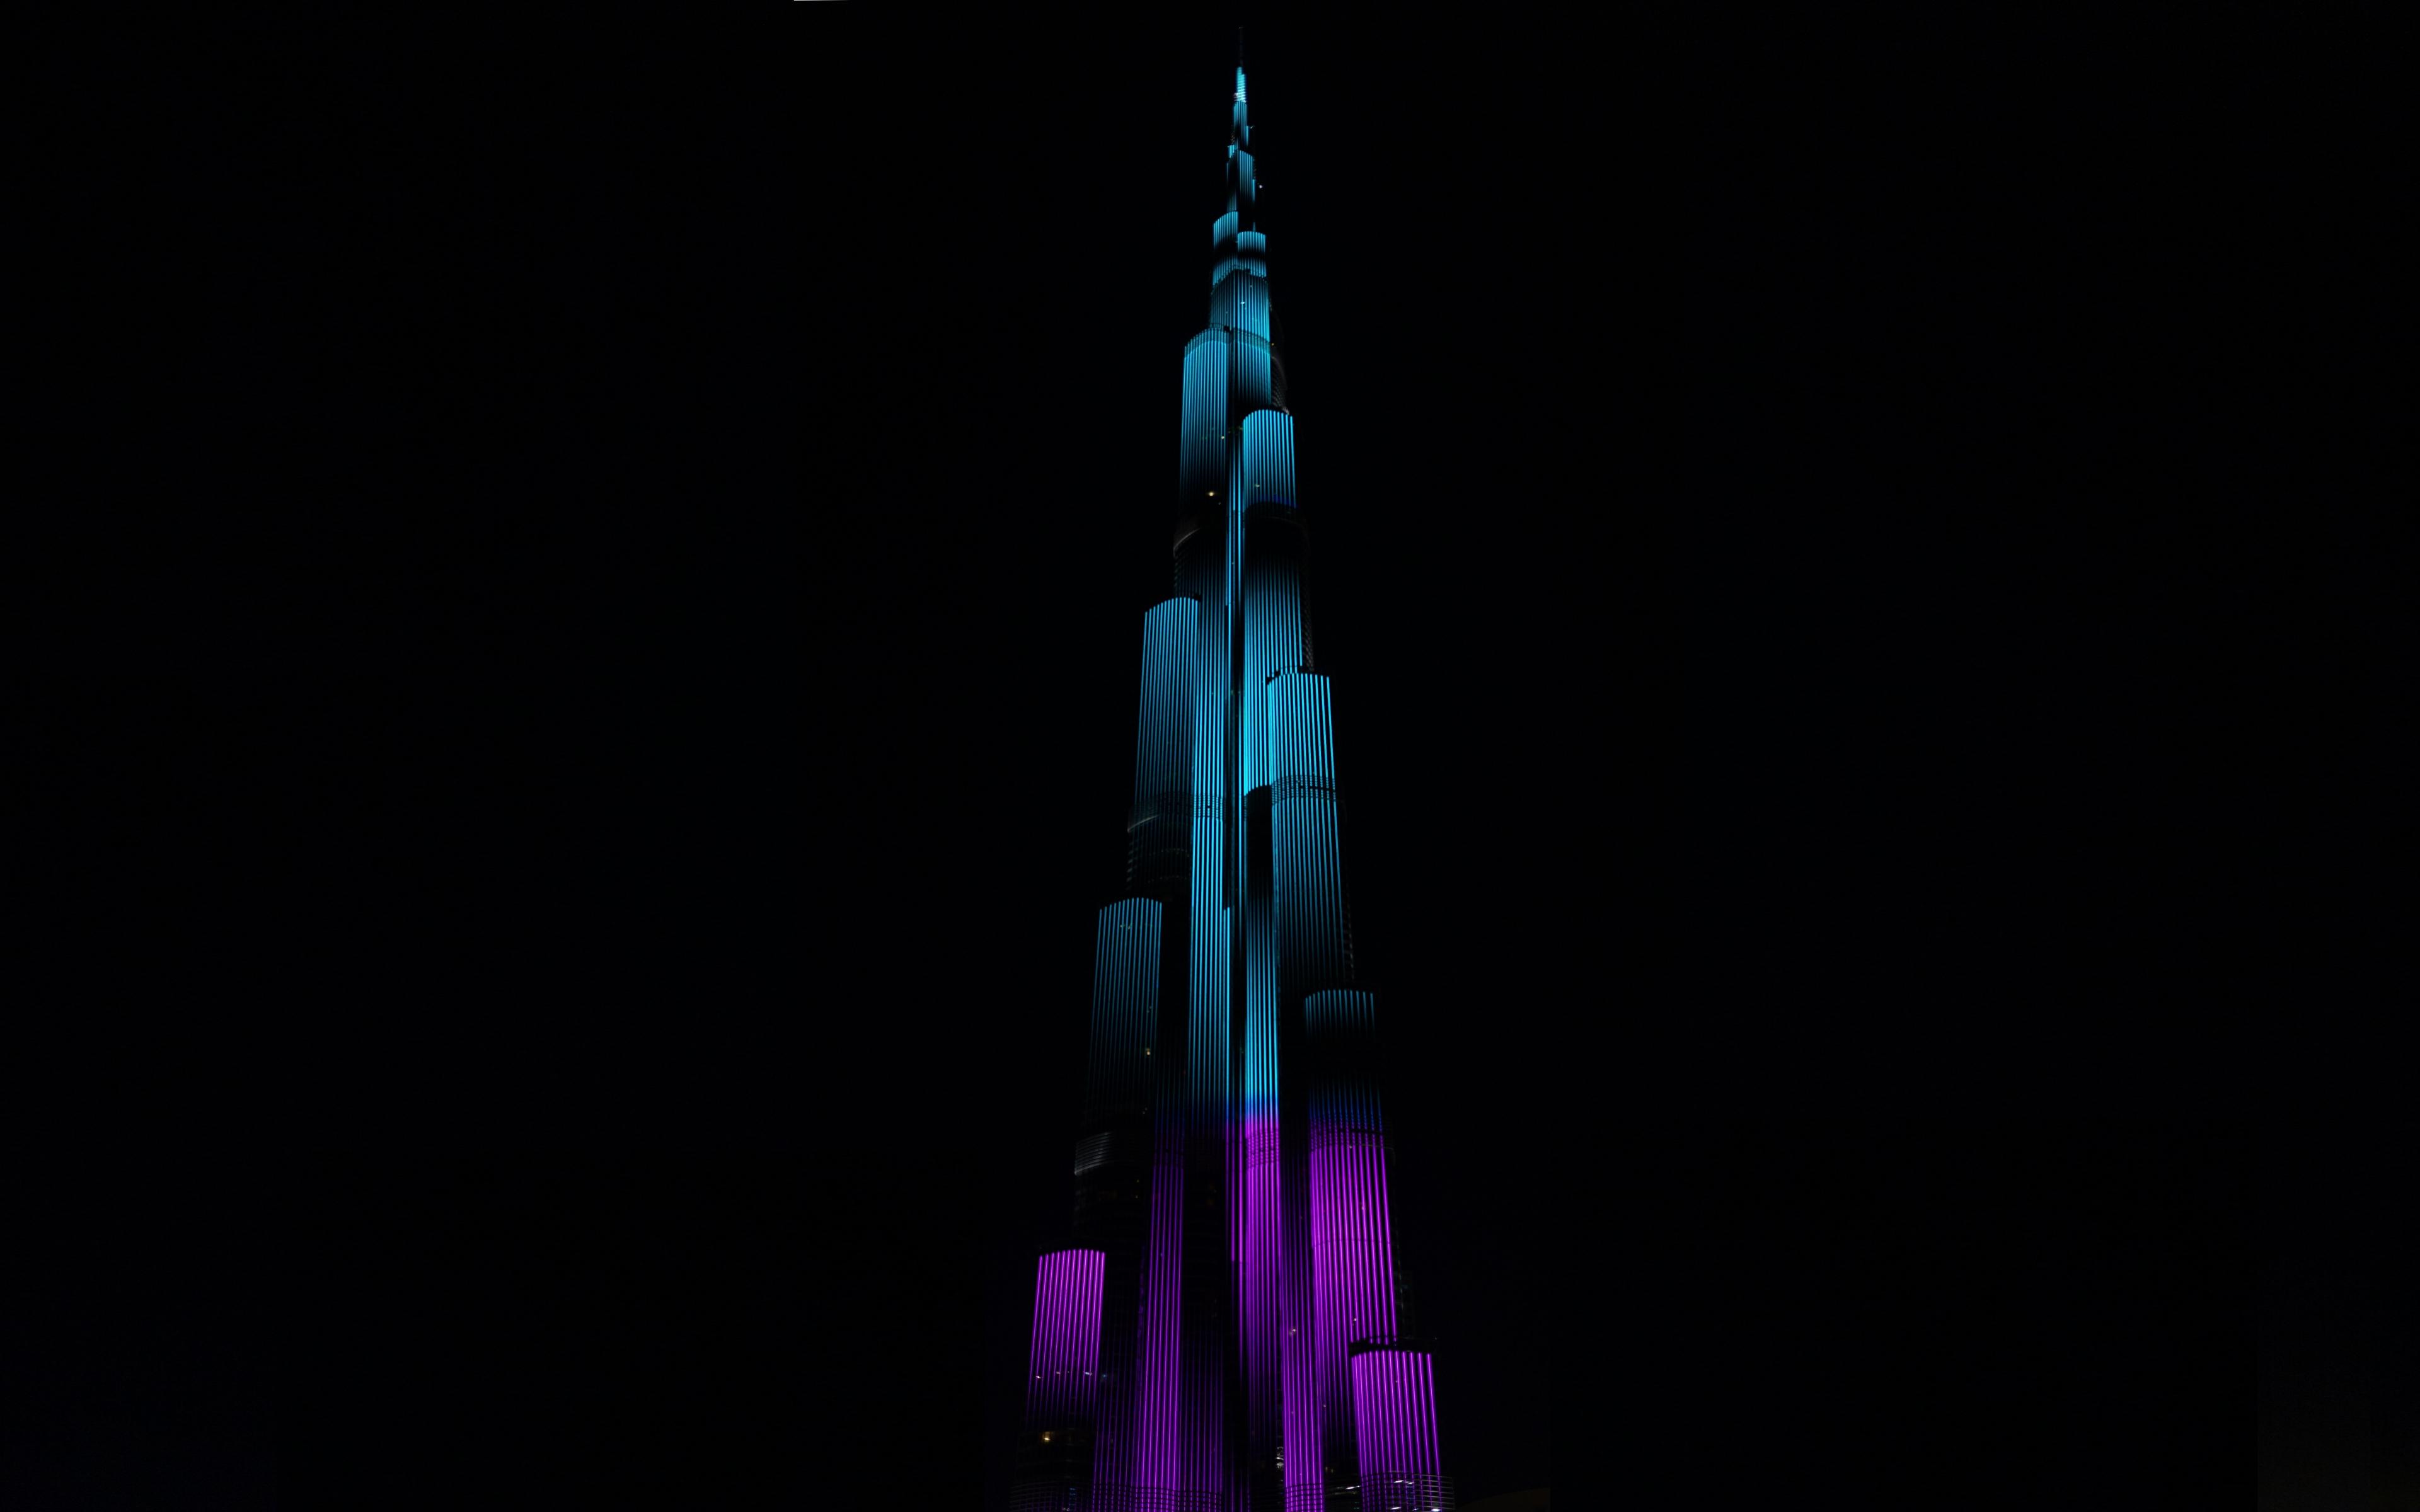 Download 3840x2400 Wallpaper Burj Khalifa Building Dubai